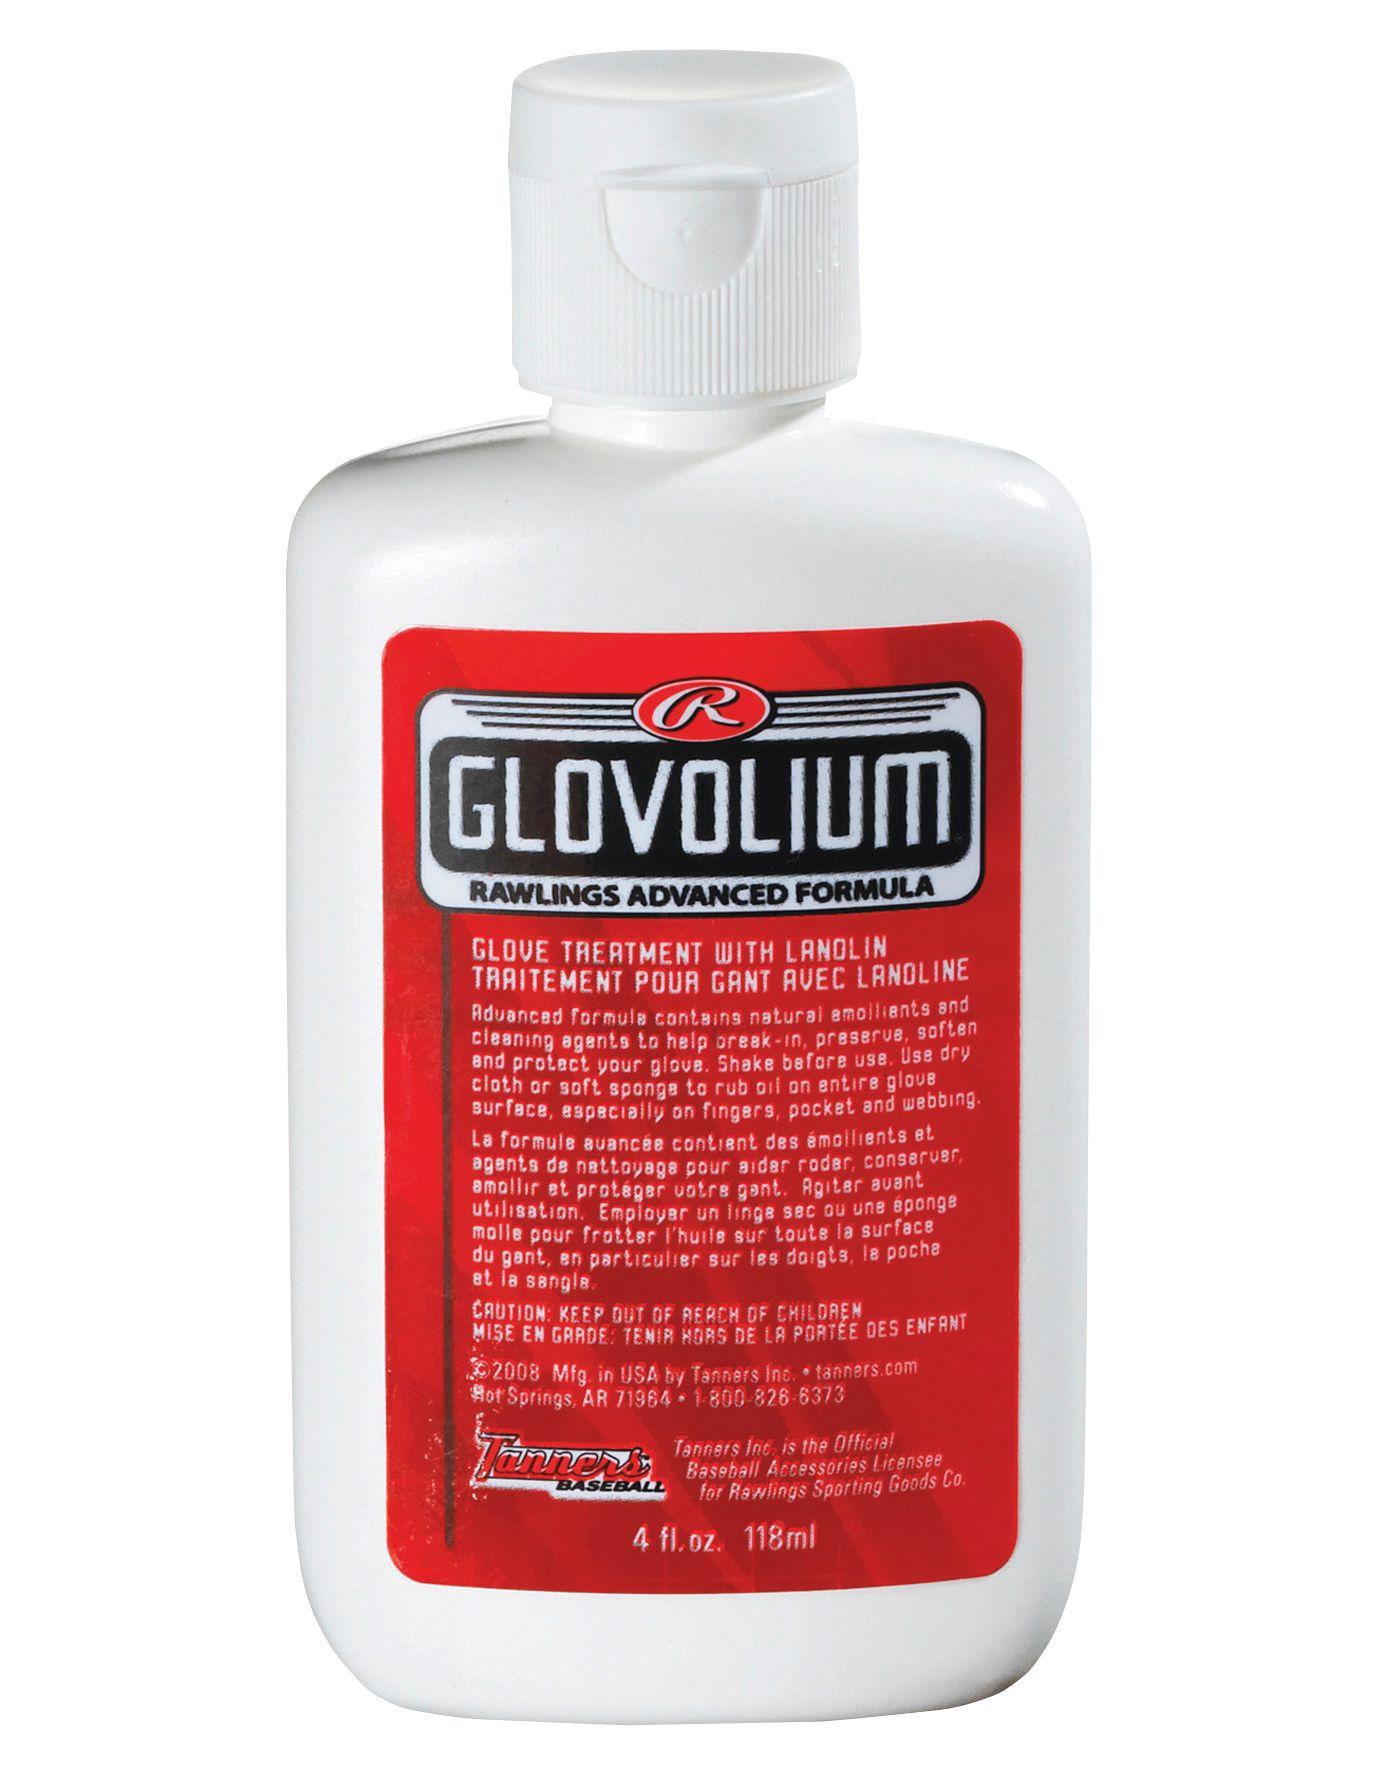 Rawlings Glovolium Glove Treatment